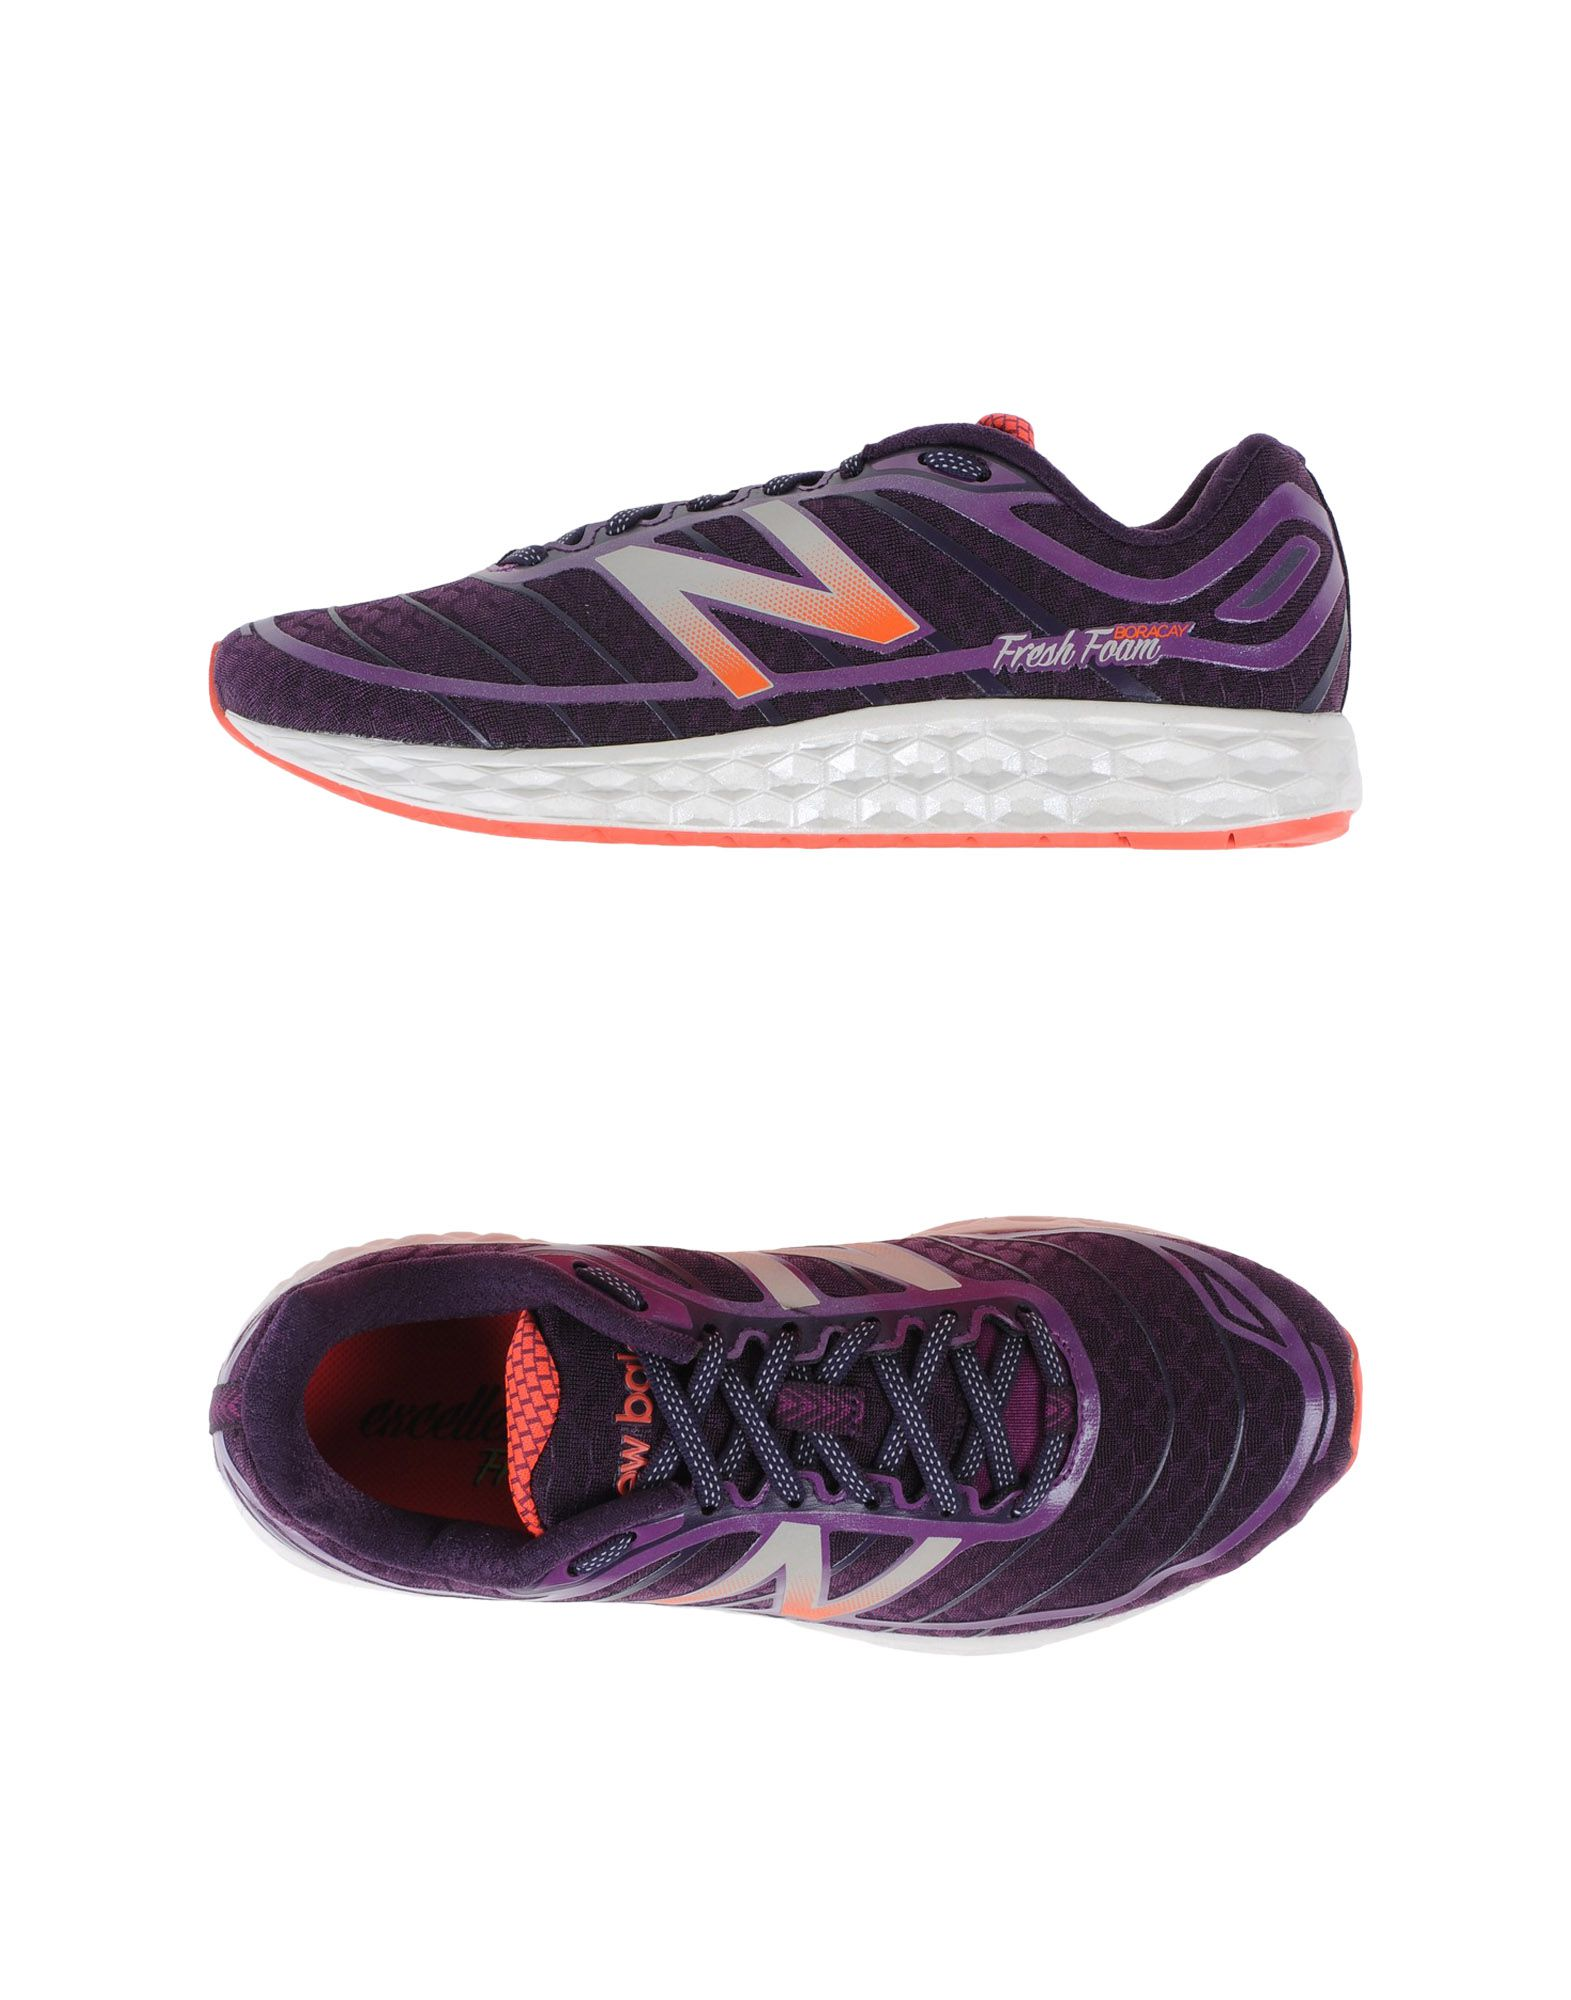 Sneakers New Balance Fresh Foam Boracay V2 - Femme - Sneakers New Balance sur